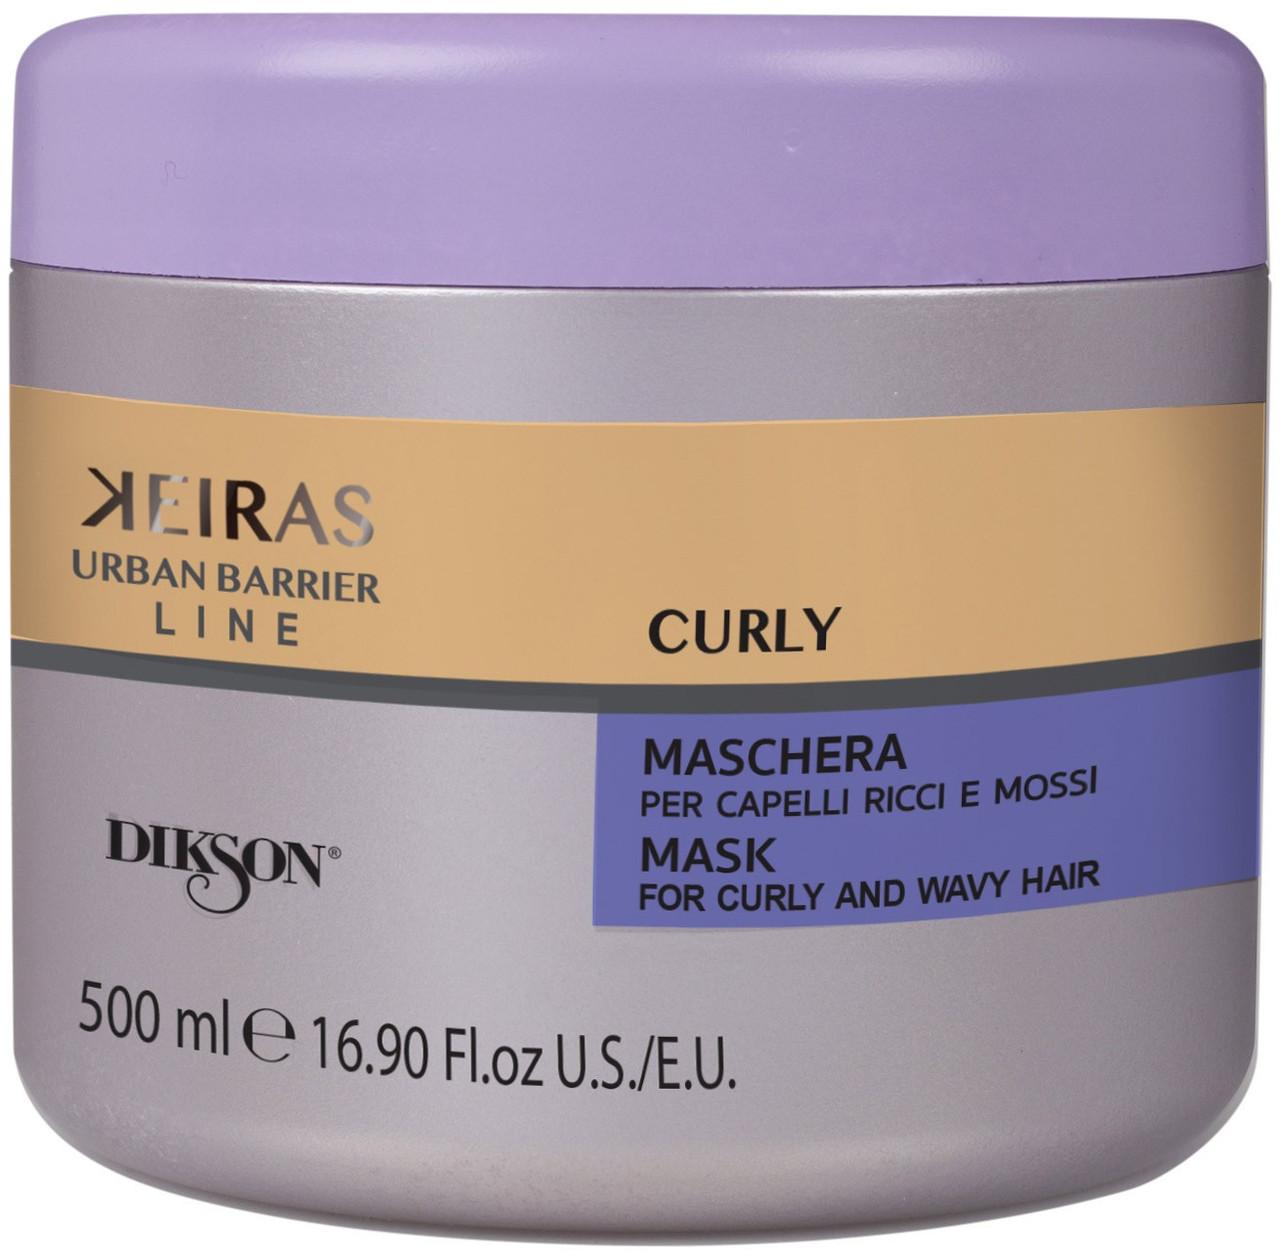 Dikson Keiras Urban Barrier Curly Mask - Маска для кудрявых и пористых волос, 500 ml